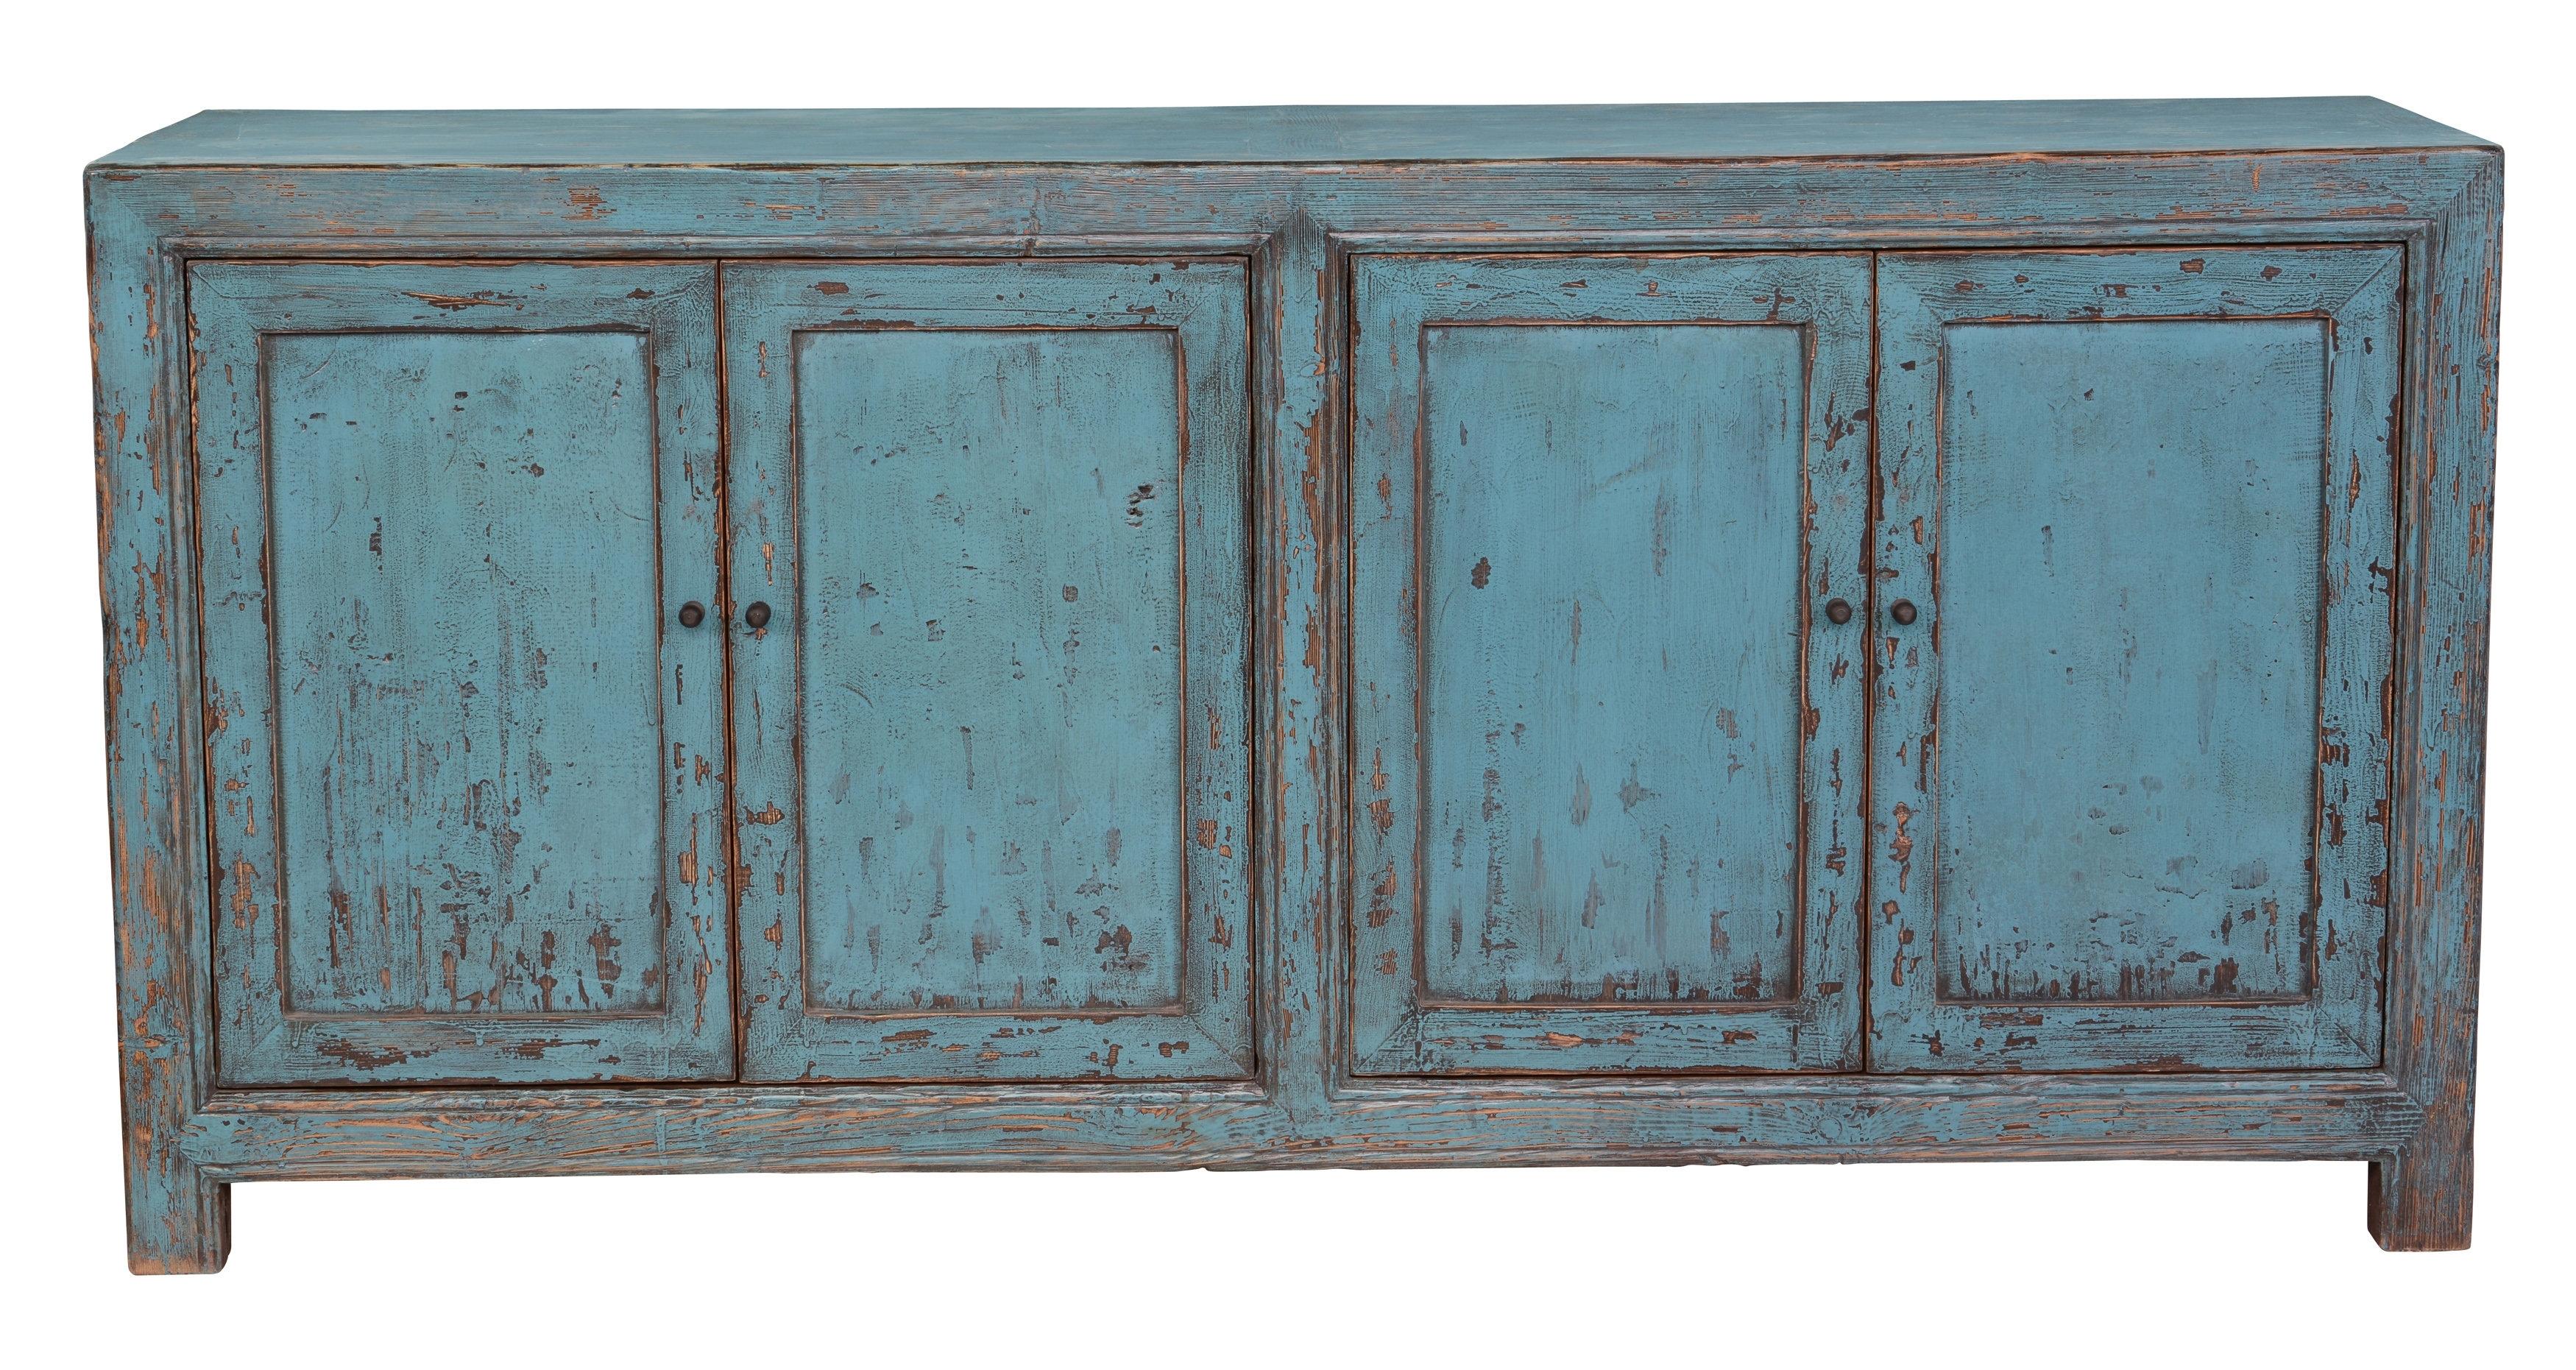 Inspiration about Tapscott Reclaimed Pine 4 Door Sideboard & Reviews | Joss & Main Within Recent Reclaimed Pine Turquoise 4 Door Sideboards (#1 of 20)